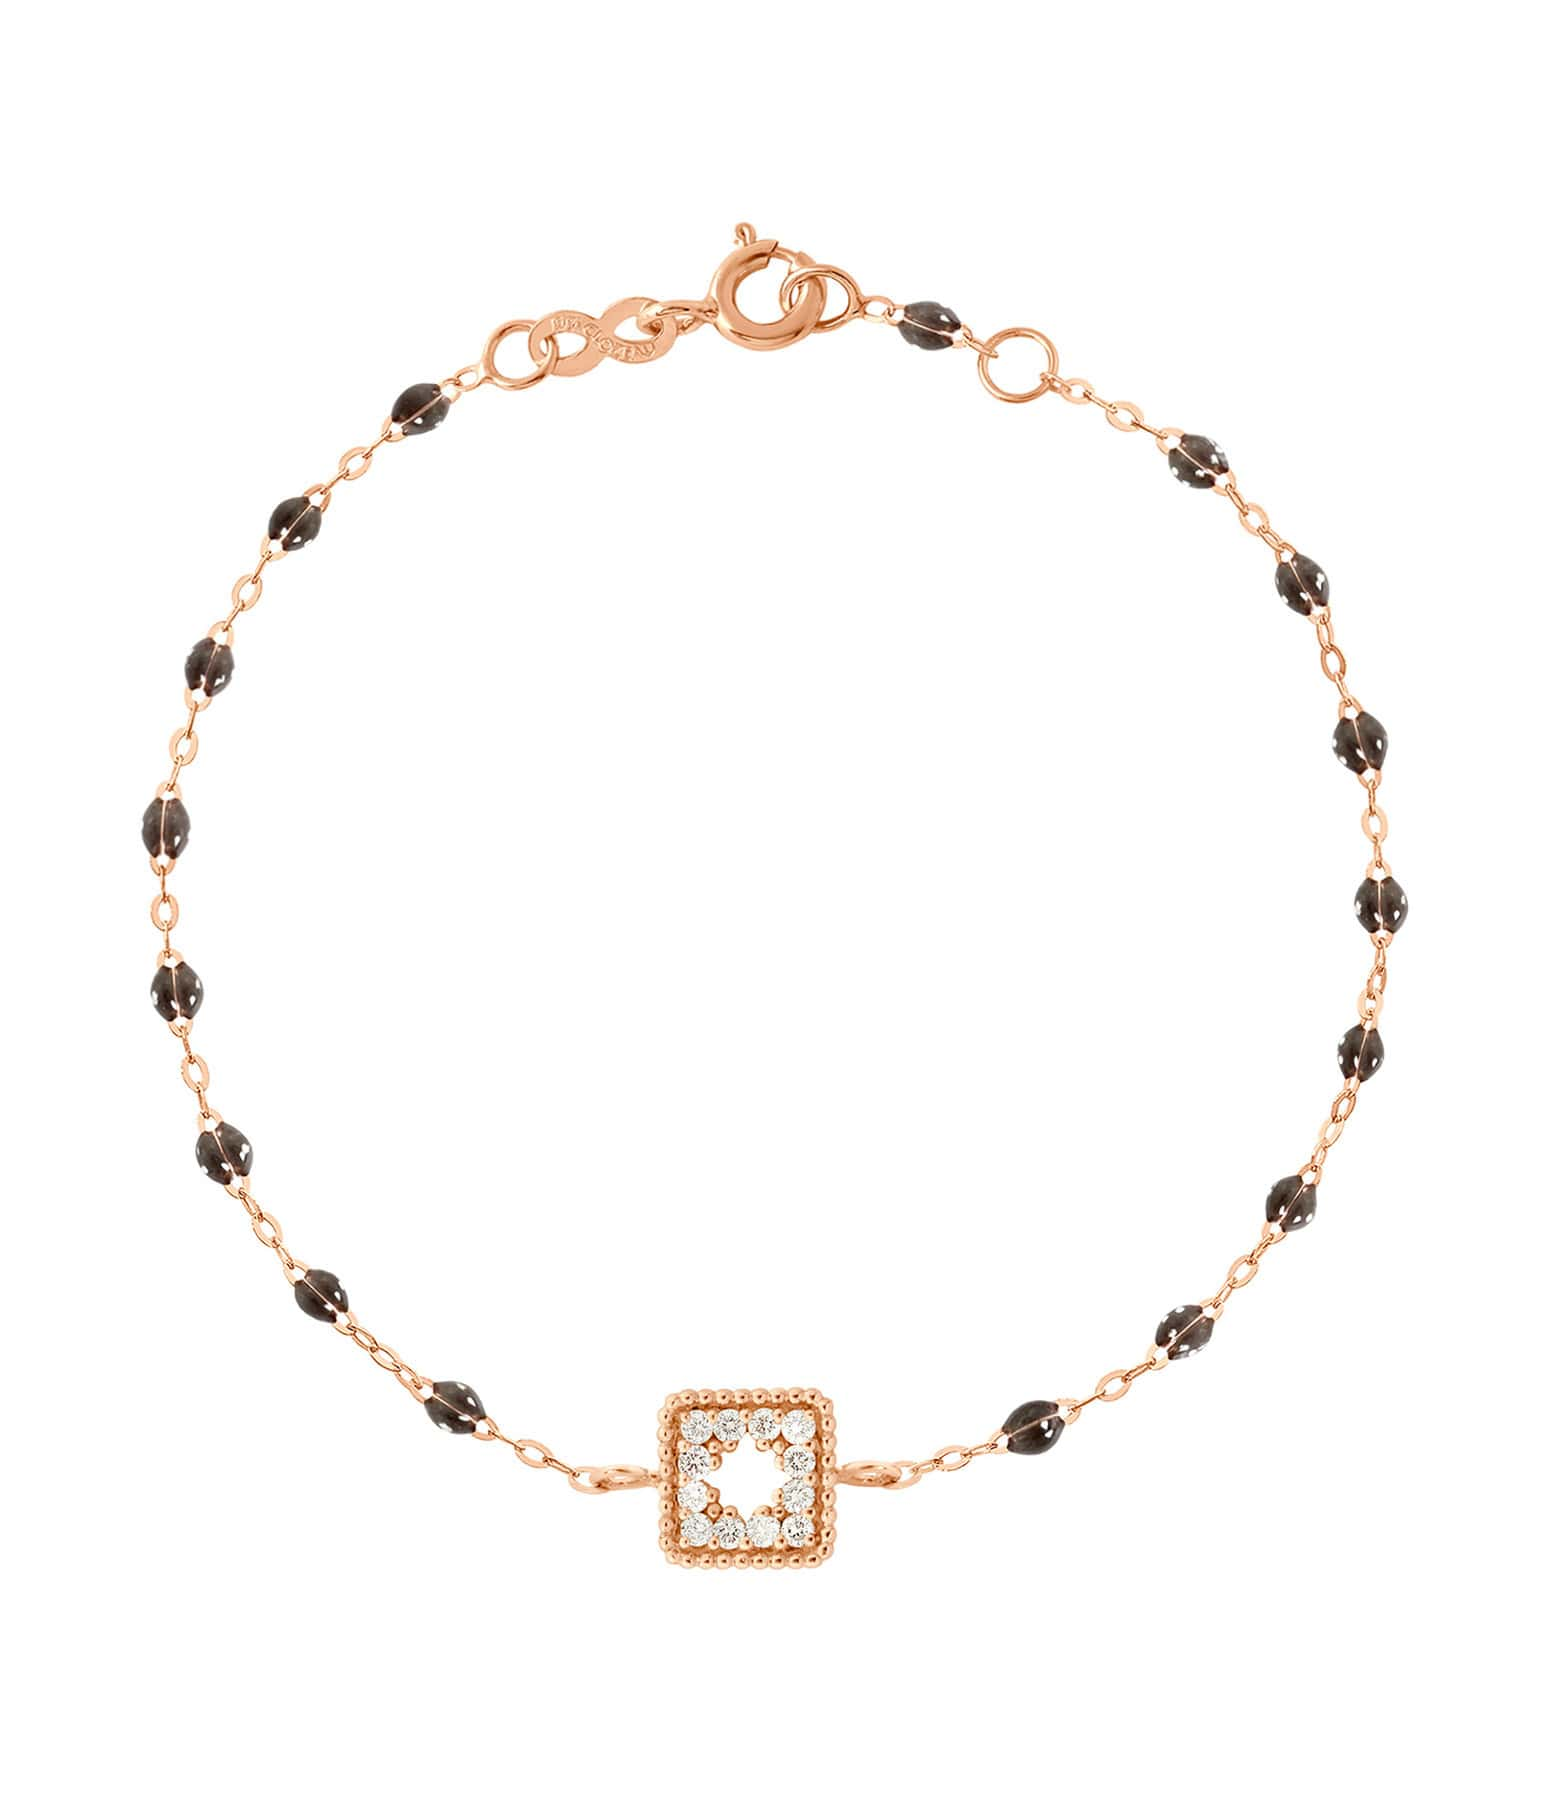 GIGI CLOZEAU - Bracelet résine Pirate Trésor Diams Or rose